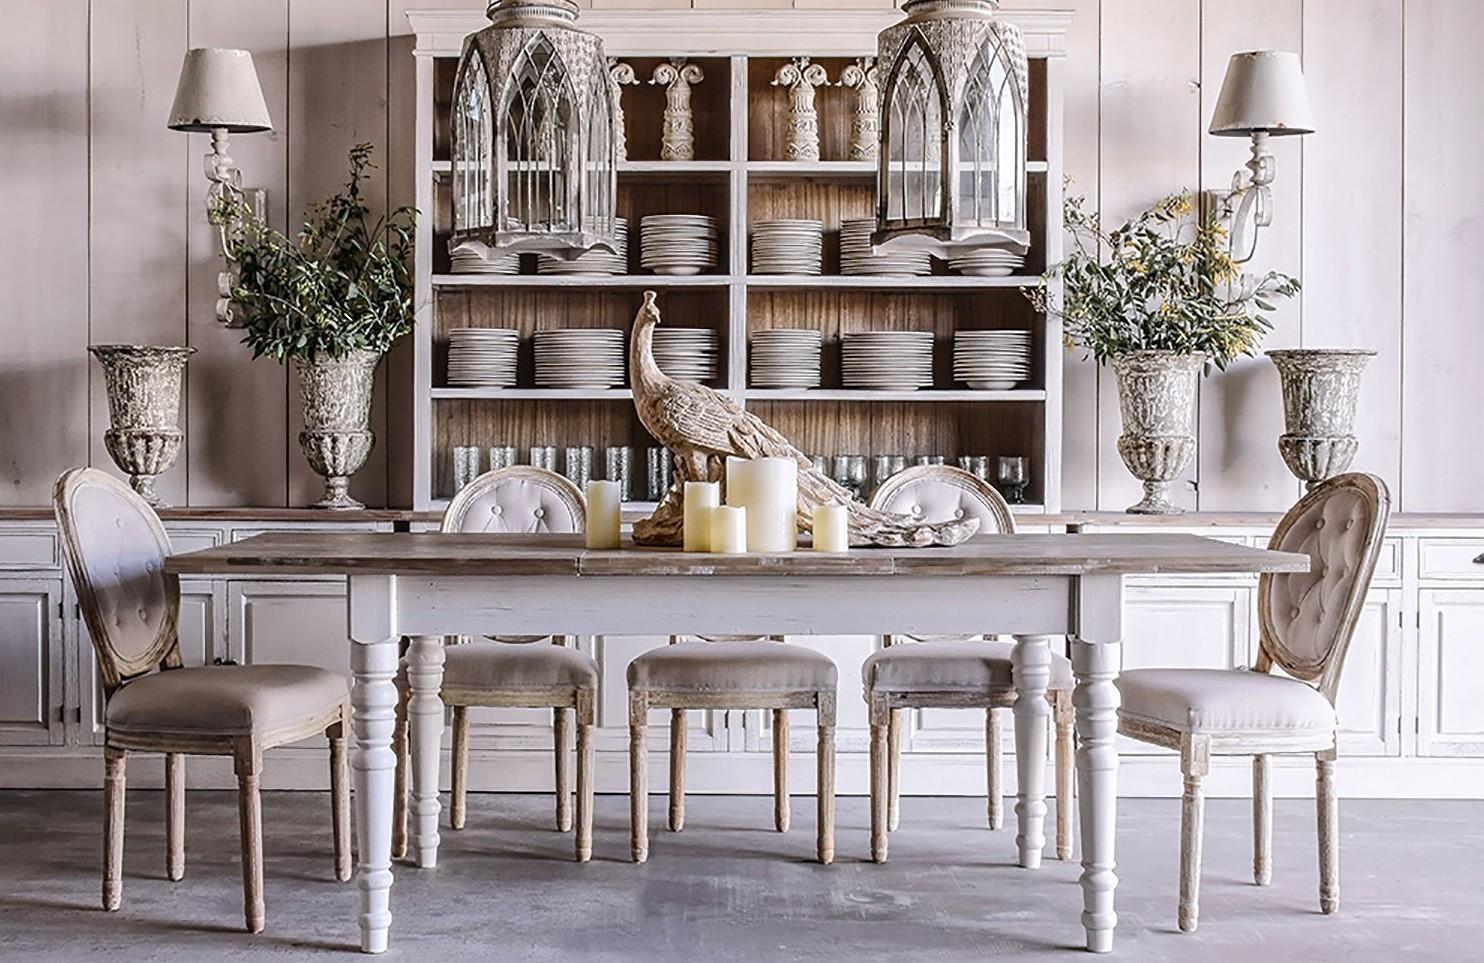 buffet credenza bianco shabby chic mobili provenzali bianchi. Black Bedroom Furniture Sets. Home Design Ideas